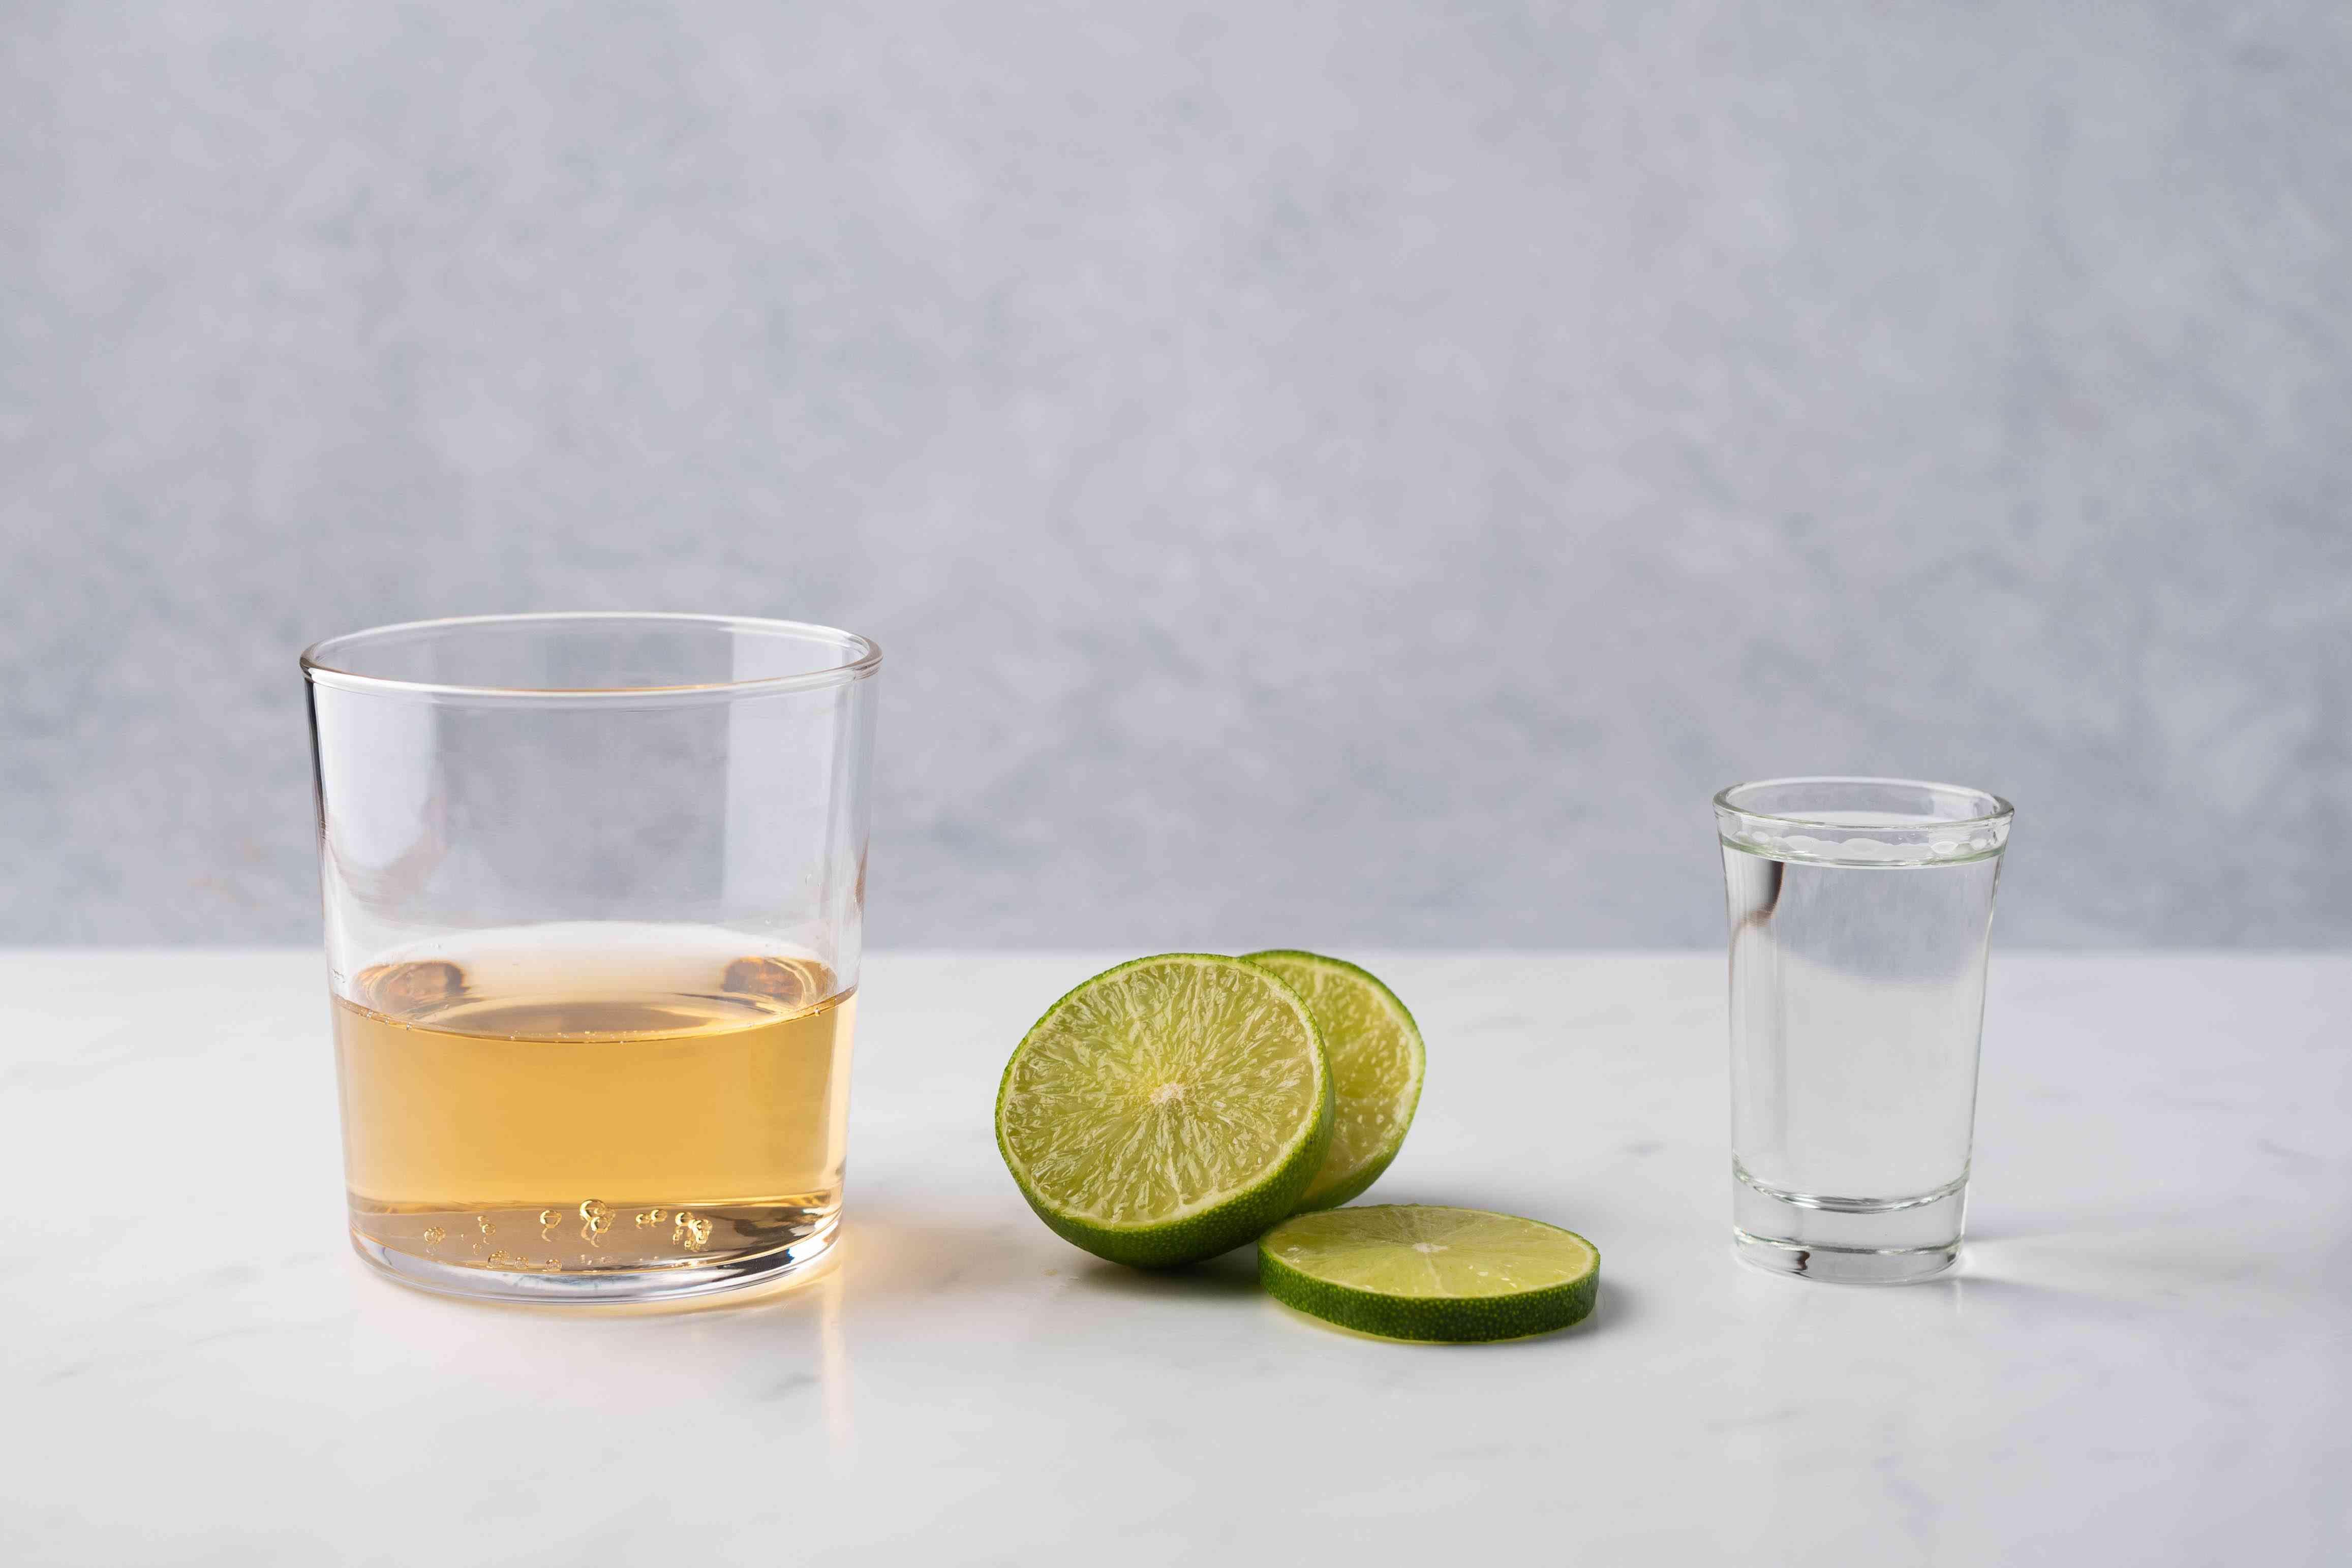 Chilcano de Pisco: A Peruvian Brandy Cocktail ingredients